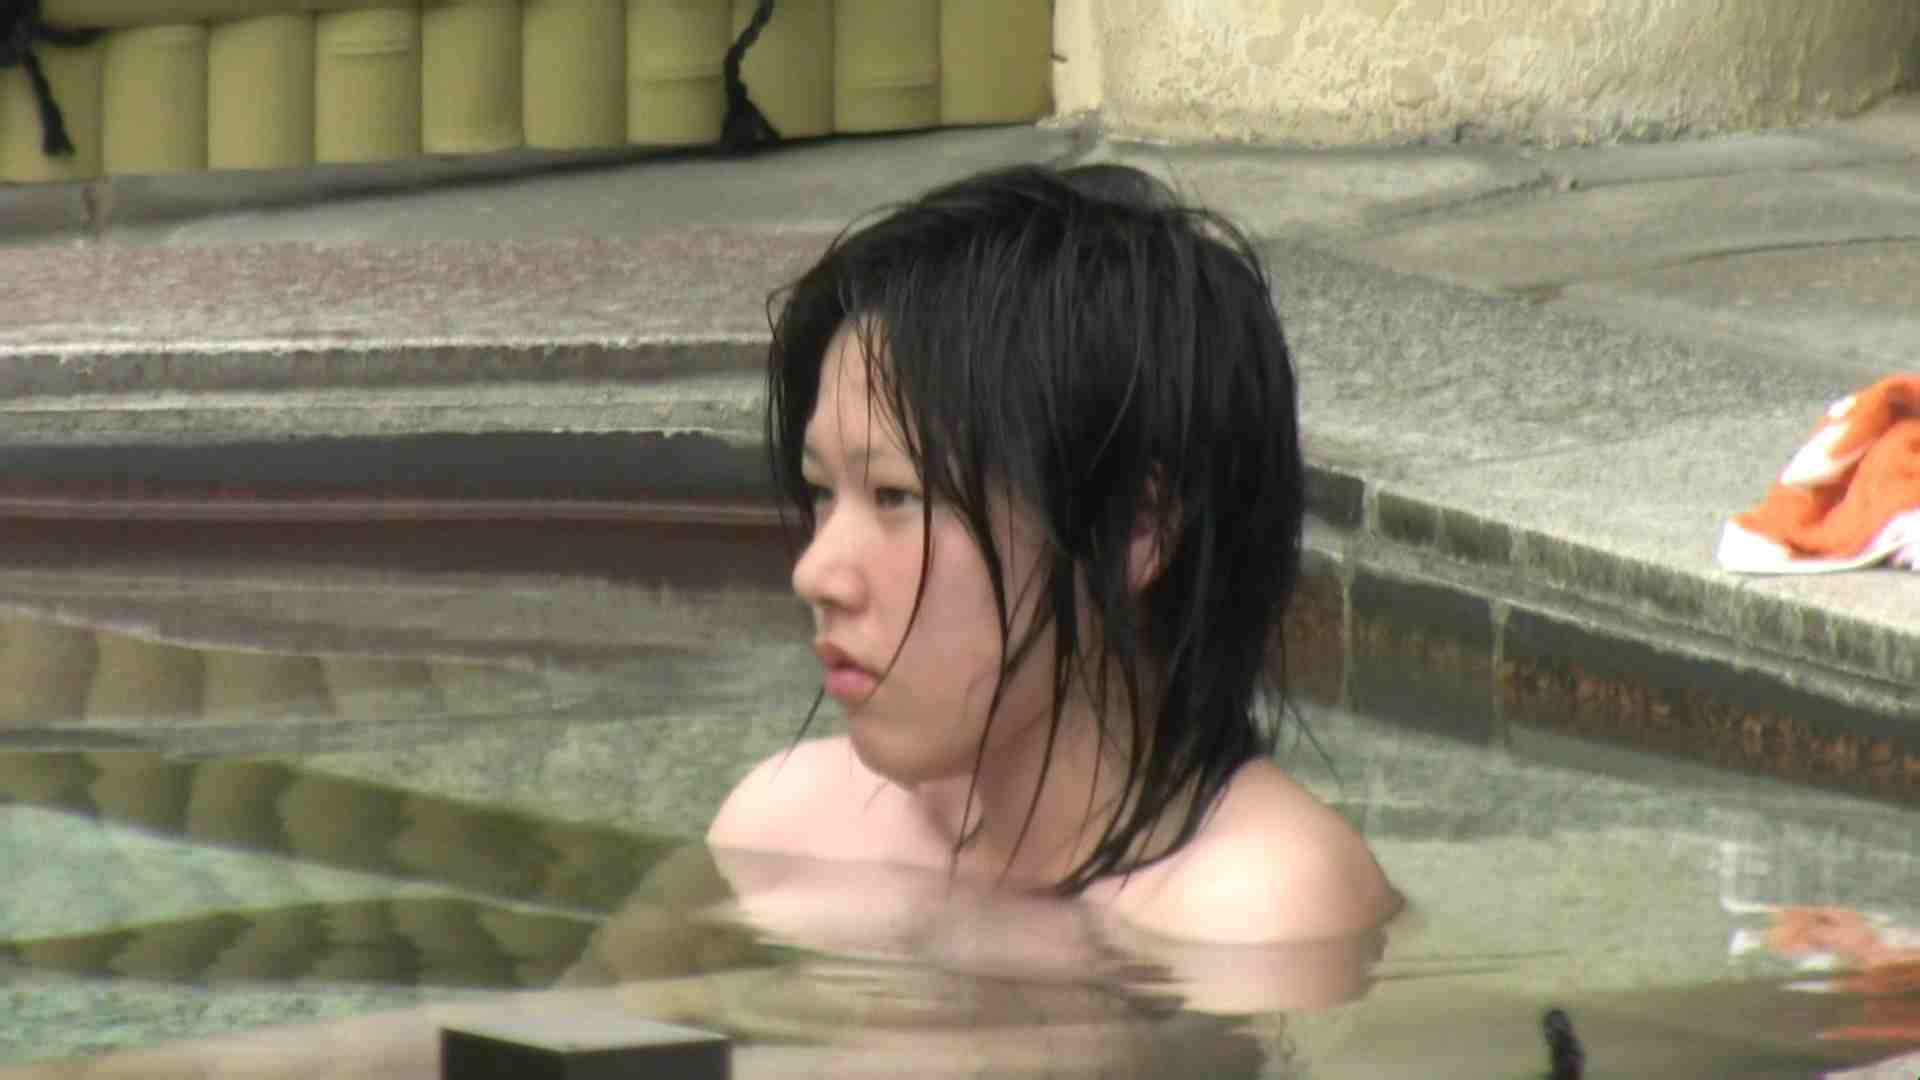 Aquaな露天風呂Vol.36 盗撮シリーズ   露天風呂編  99PIX 57